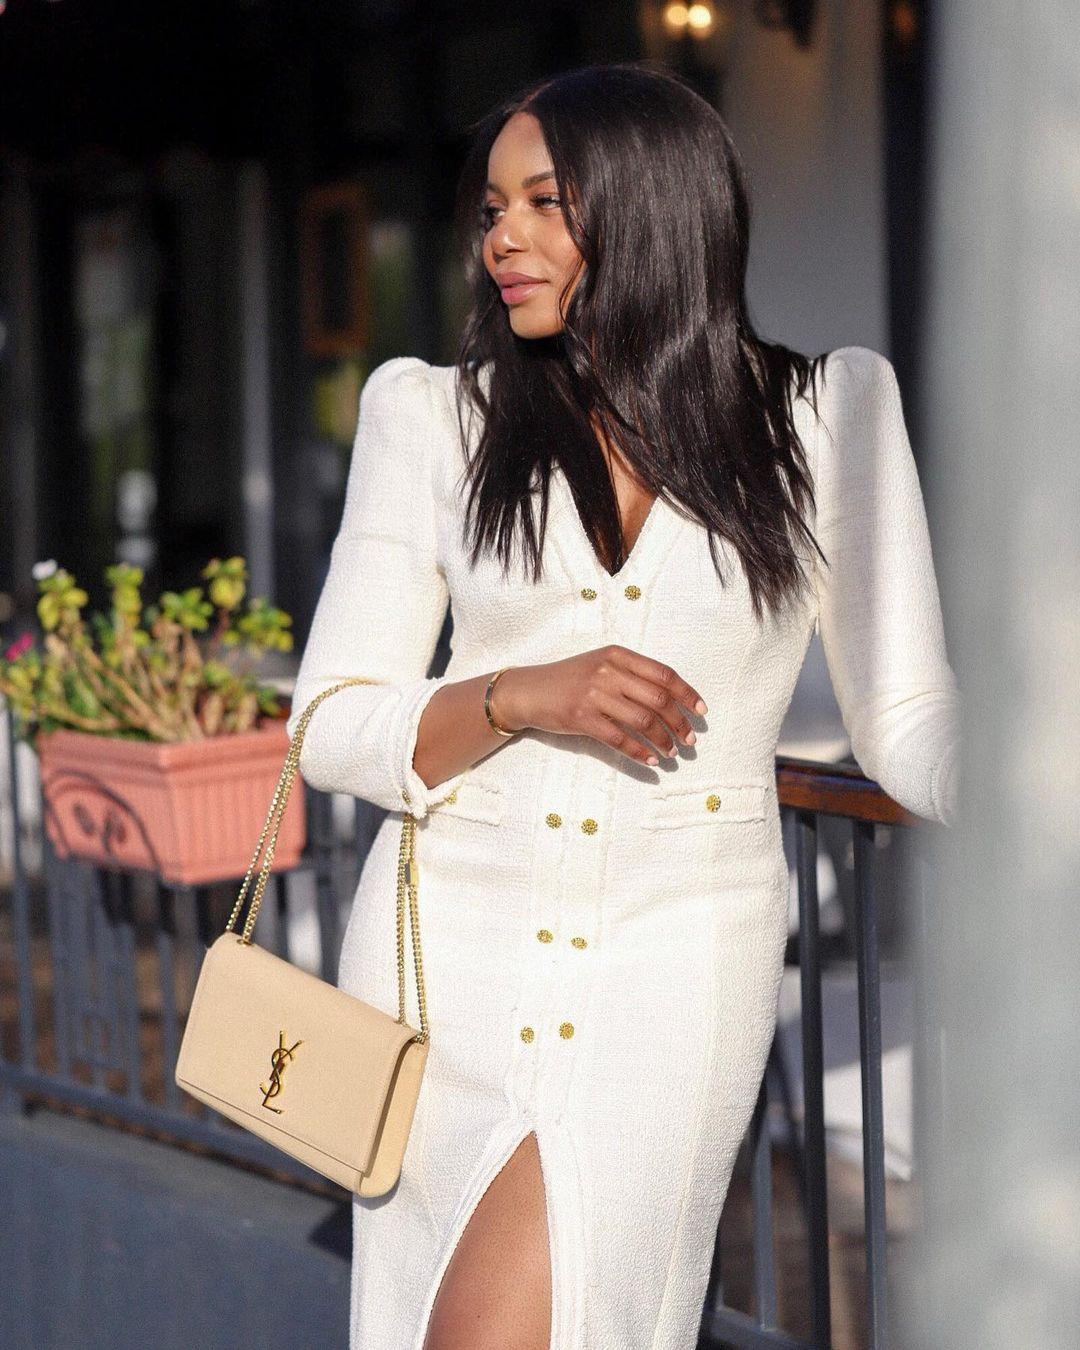 Kaye Bassey in white dress and YSL handbag - capsule wardrobe ideas